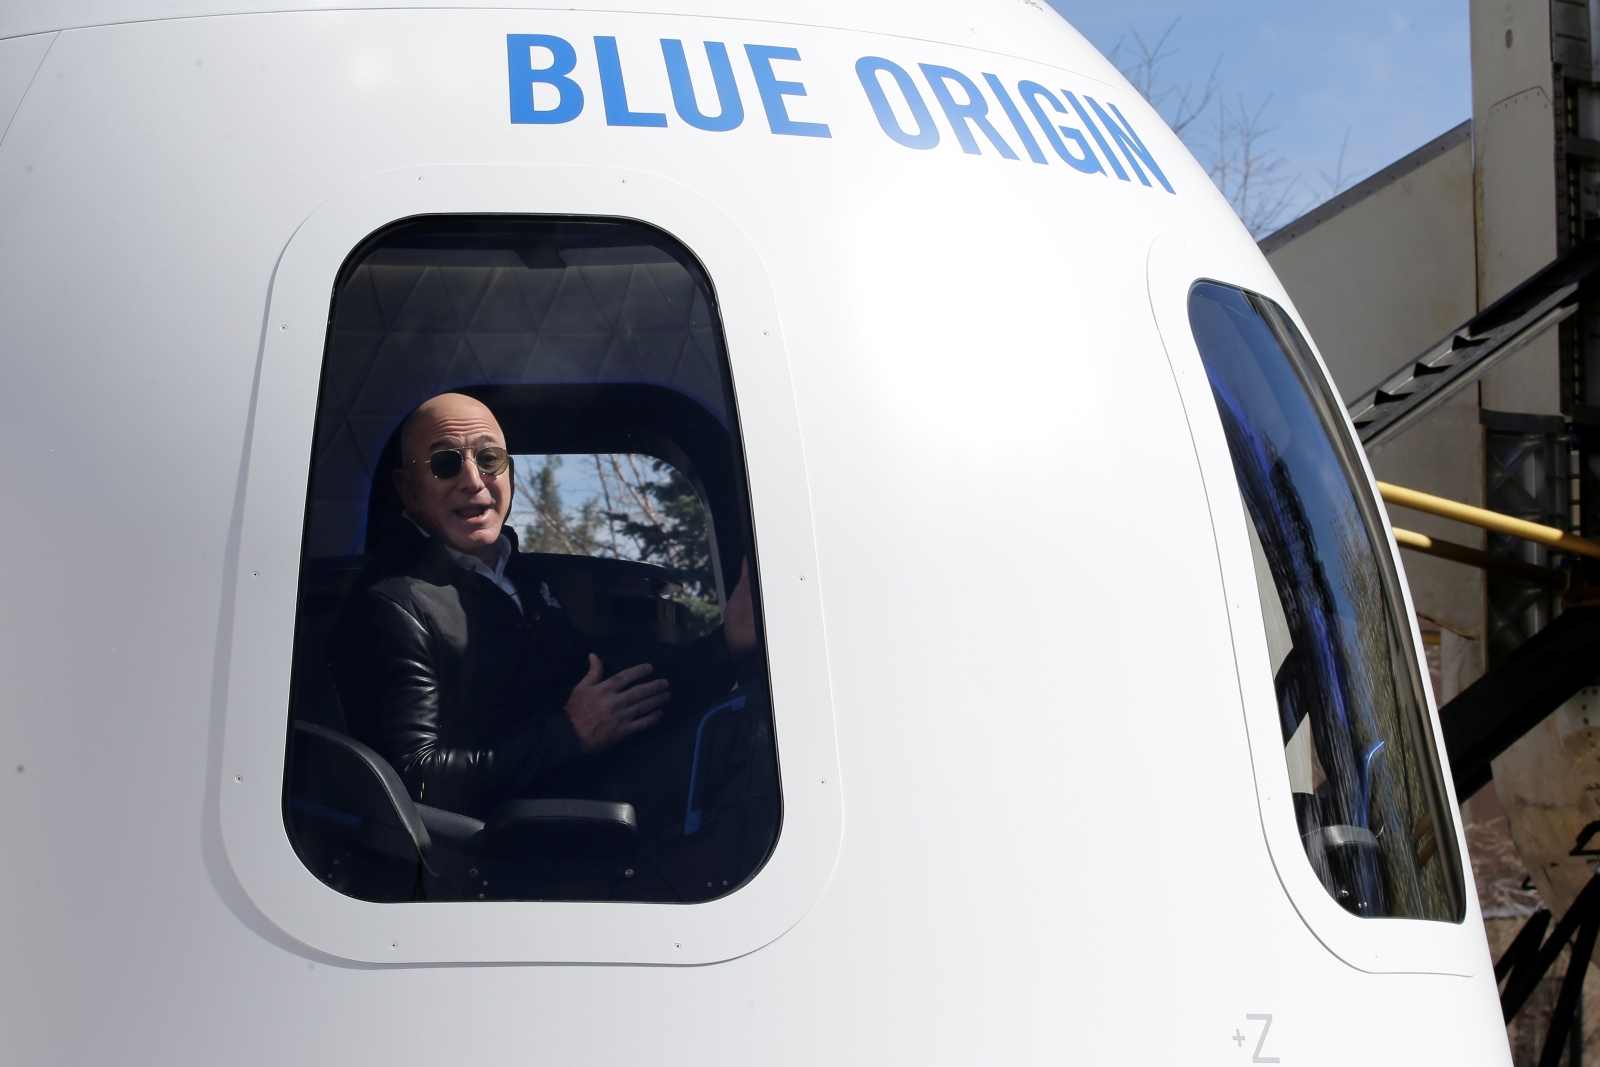 Blue Origin boss Jeff Bezos